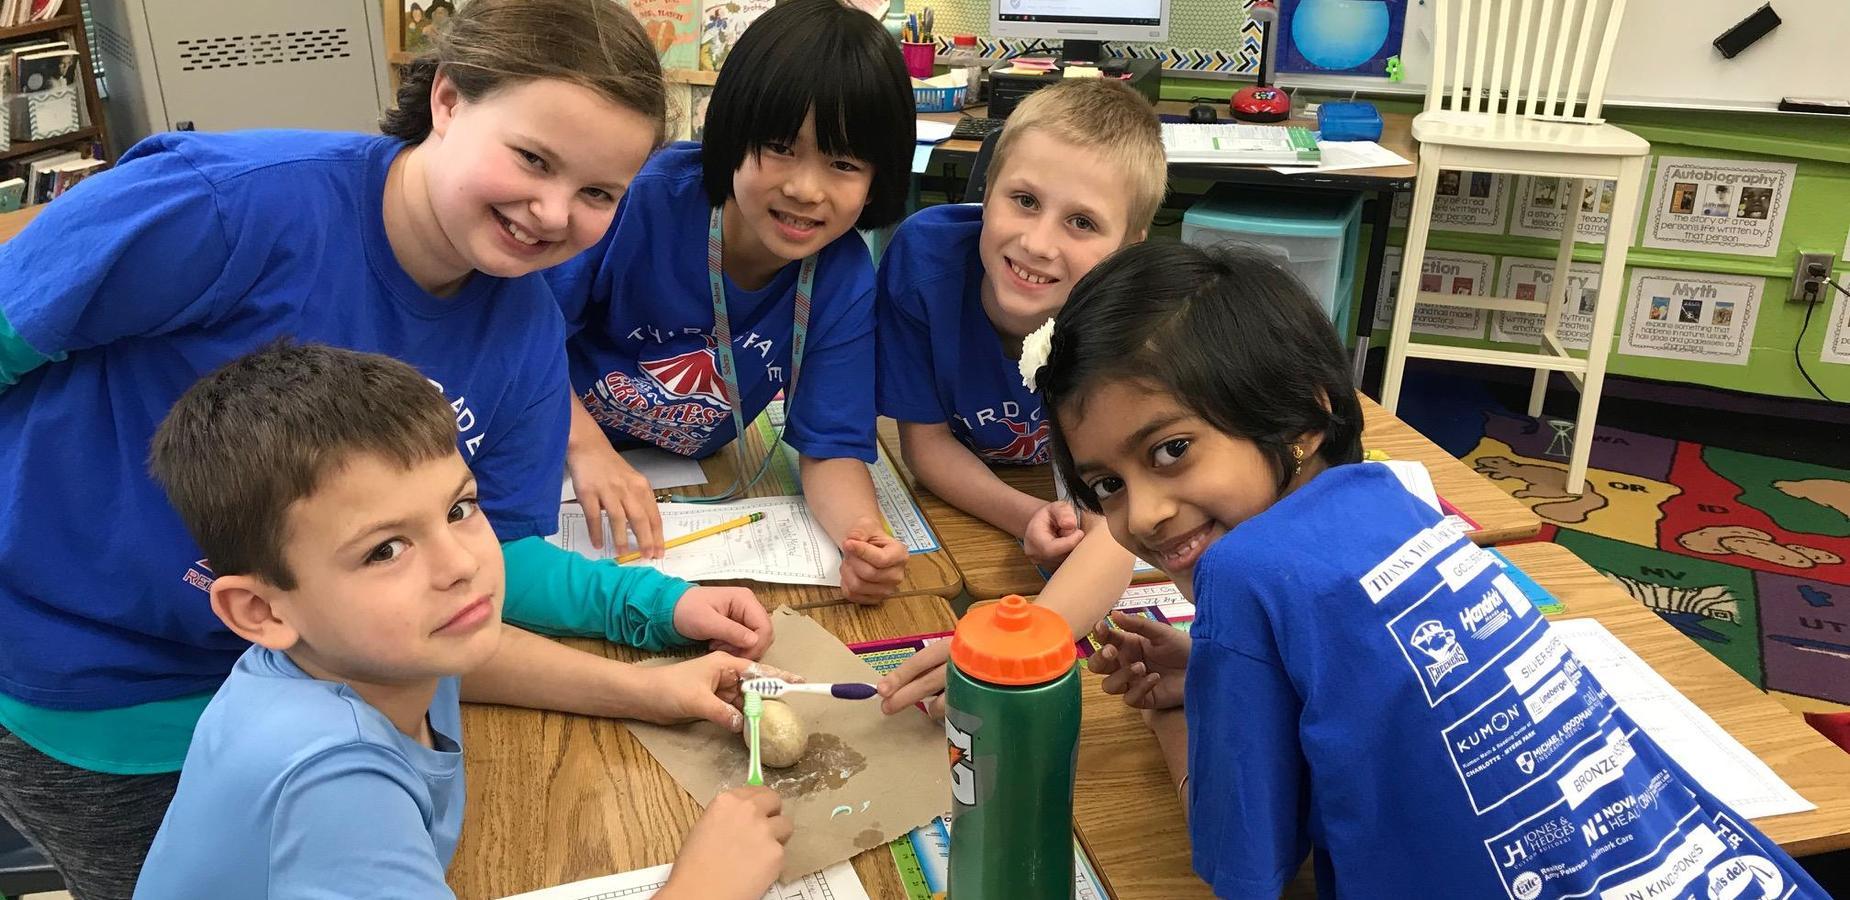 3rd Grade Dental Hygiene Project